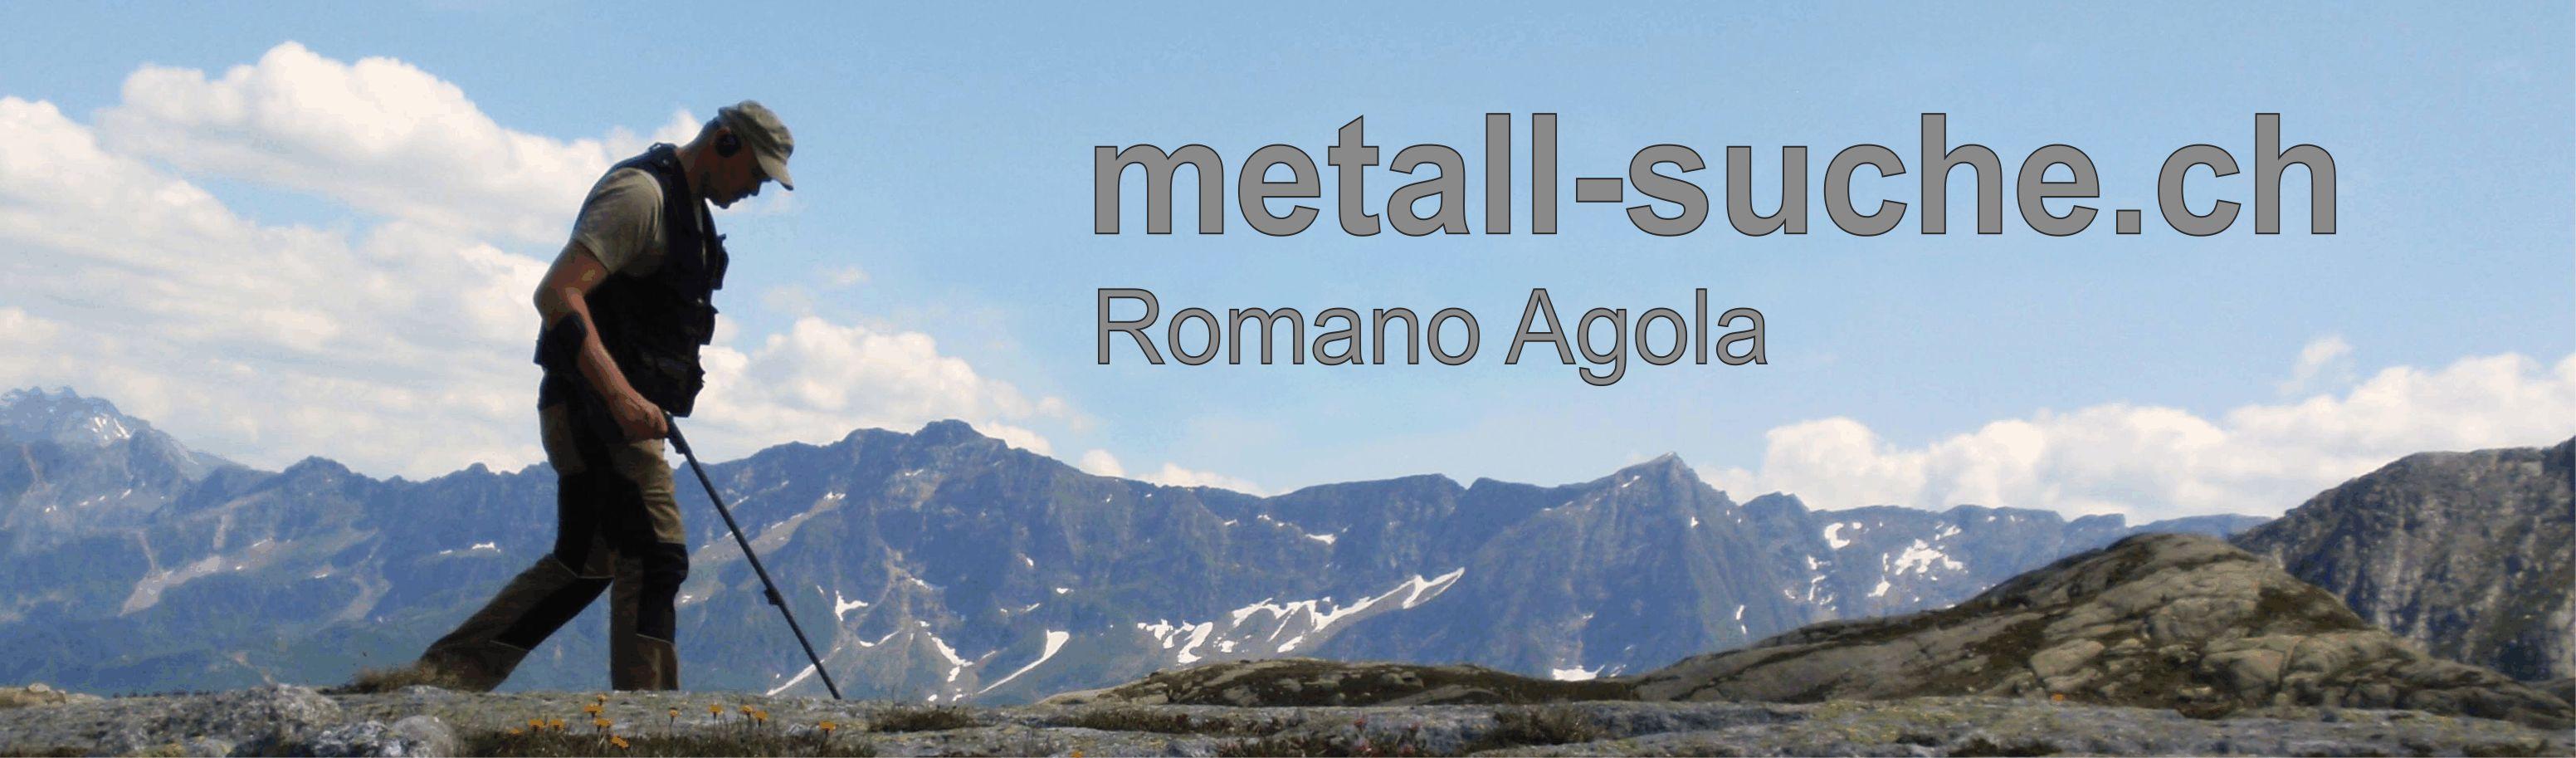 Metall-suche.ch